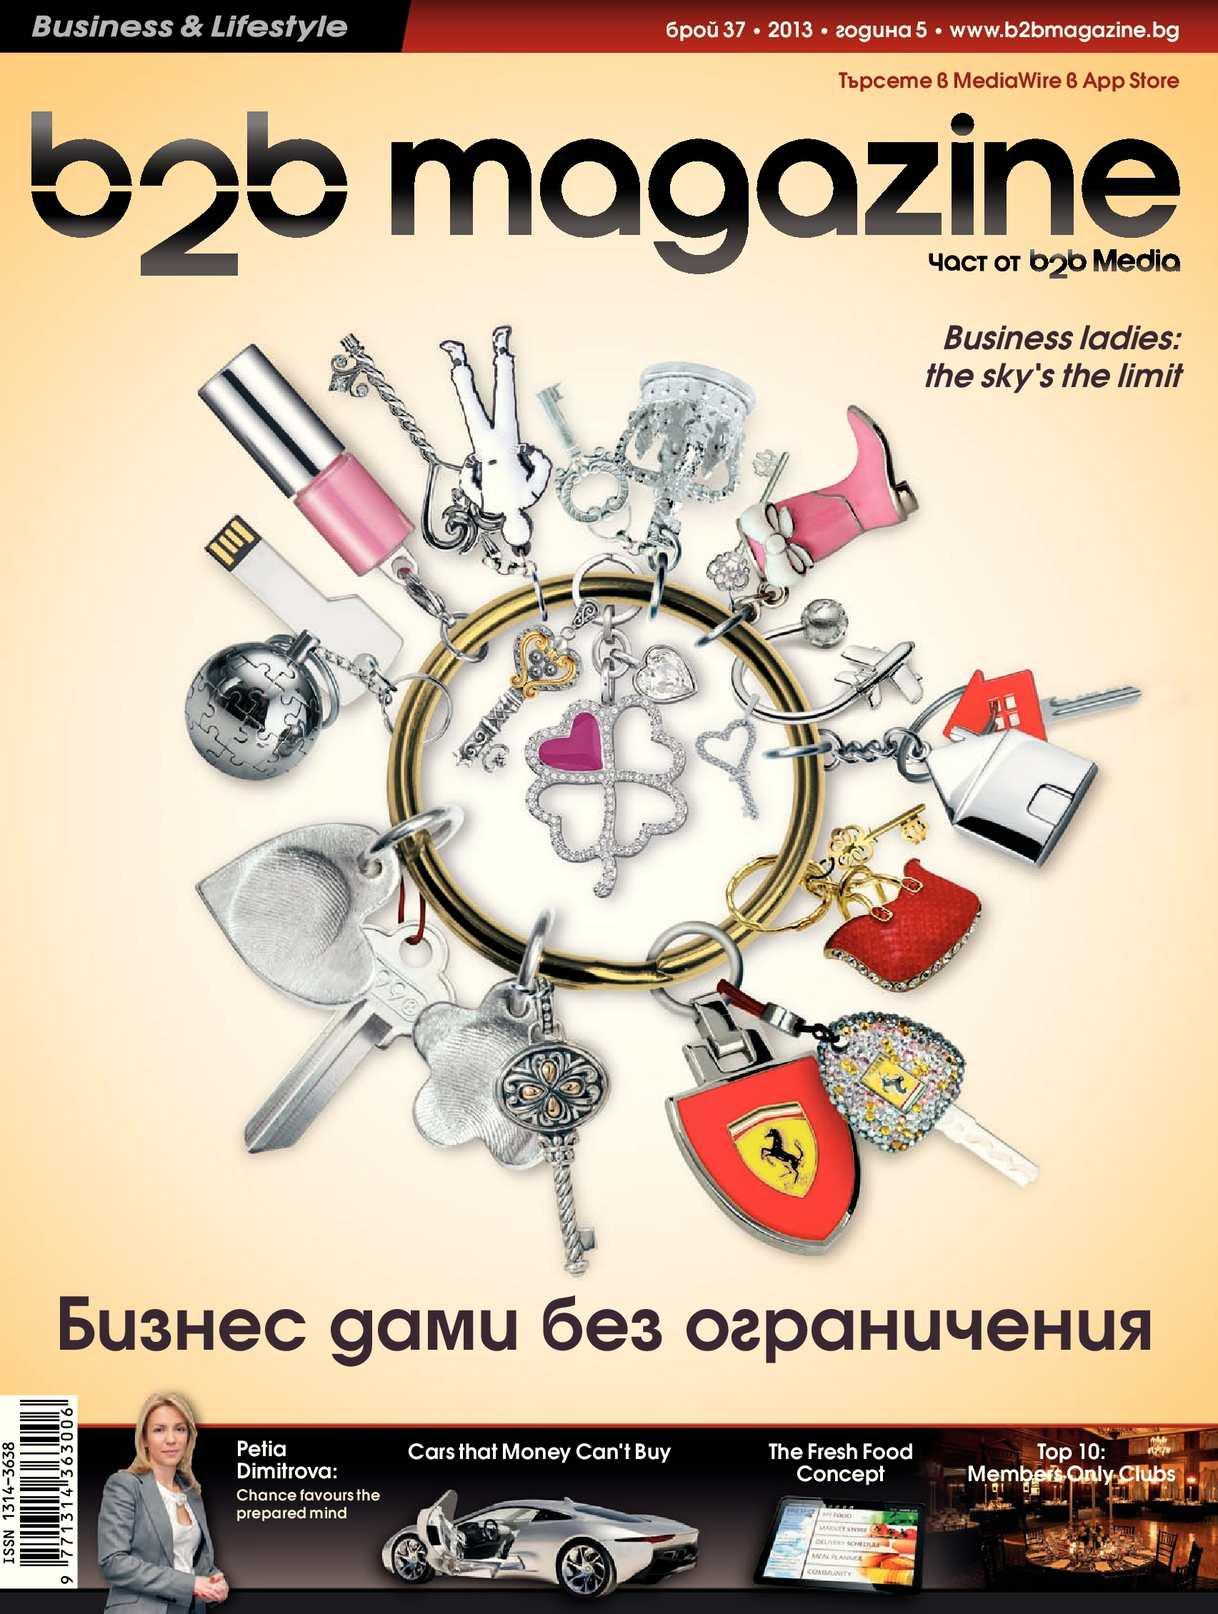 aa720aa3356 Calaméo - Списание B2B Magazine - брой 37 / 2013